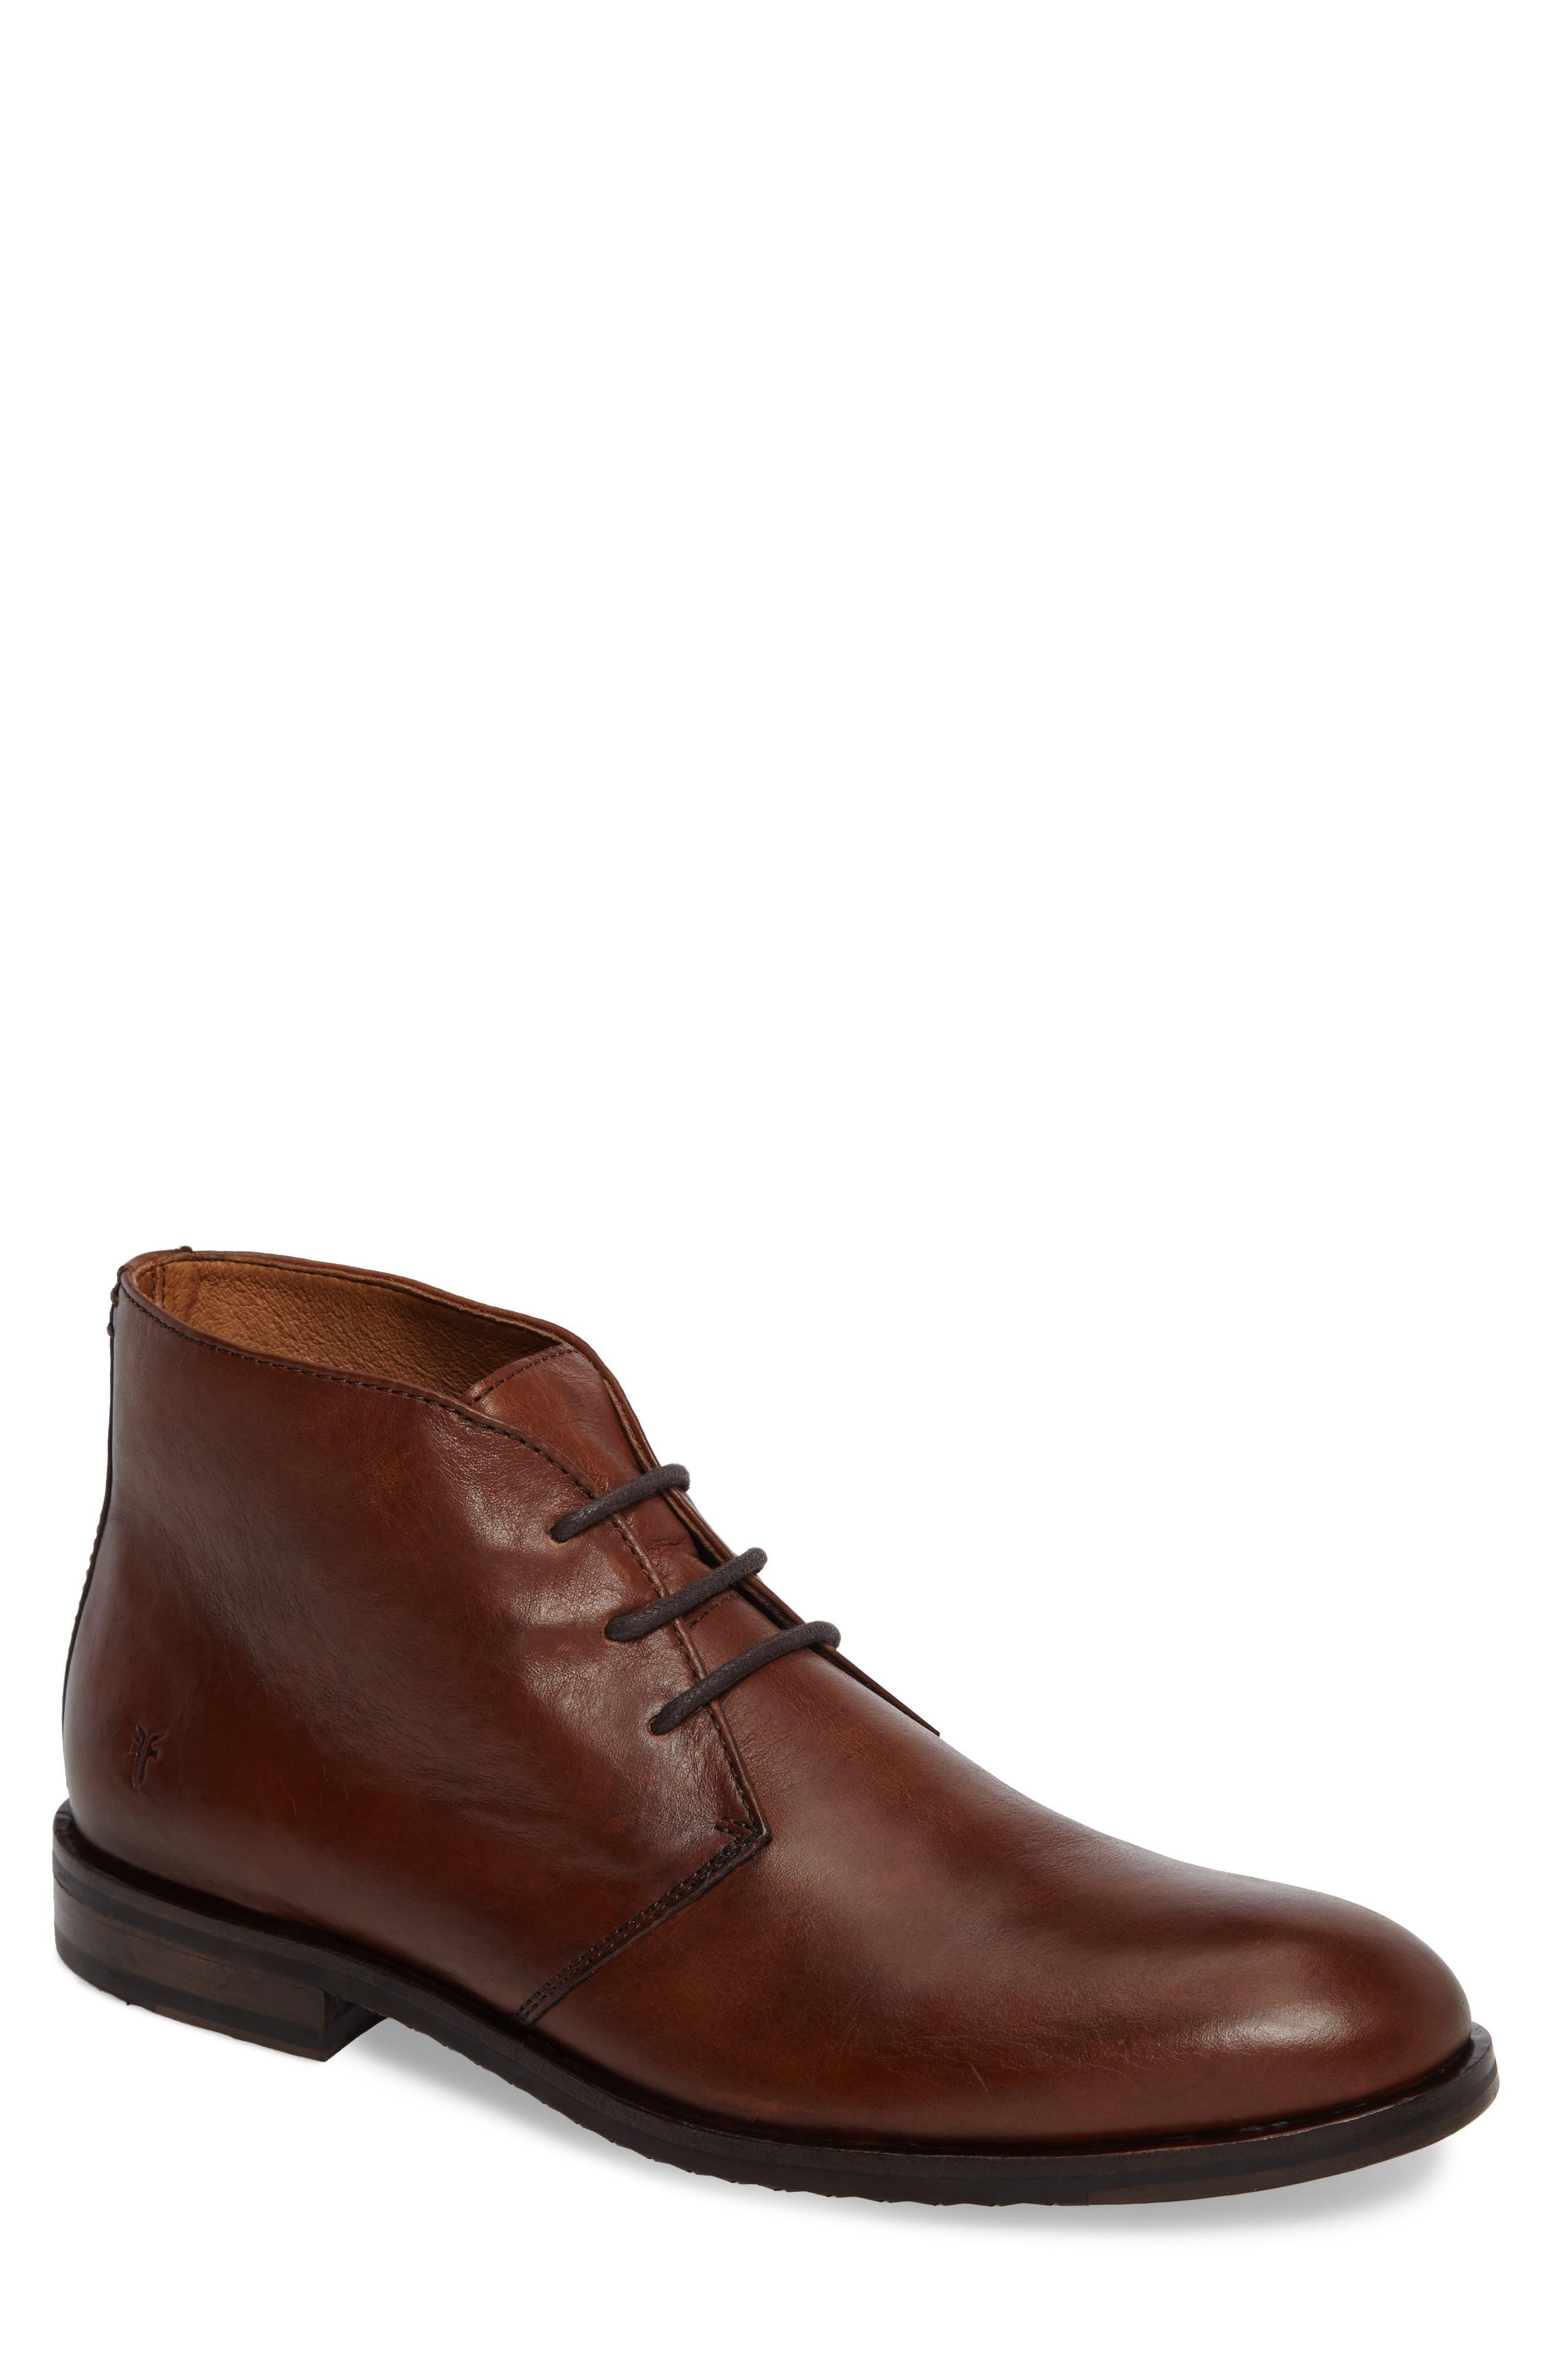 Sam Chukka Boot,                             Main thumbnail 1, color,                             Cognac Leather